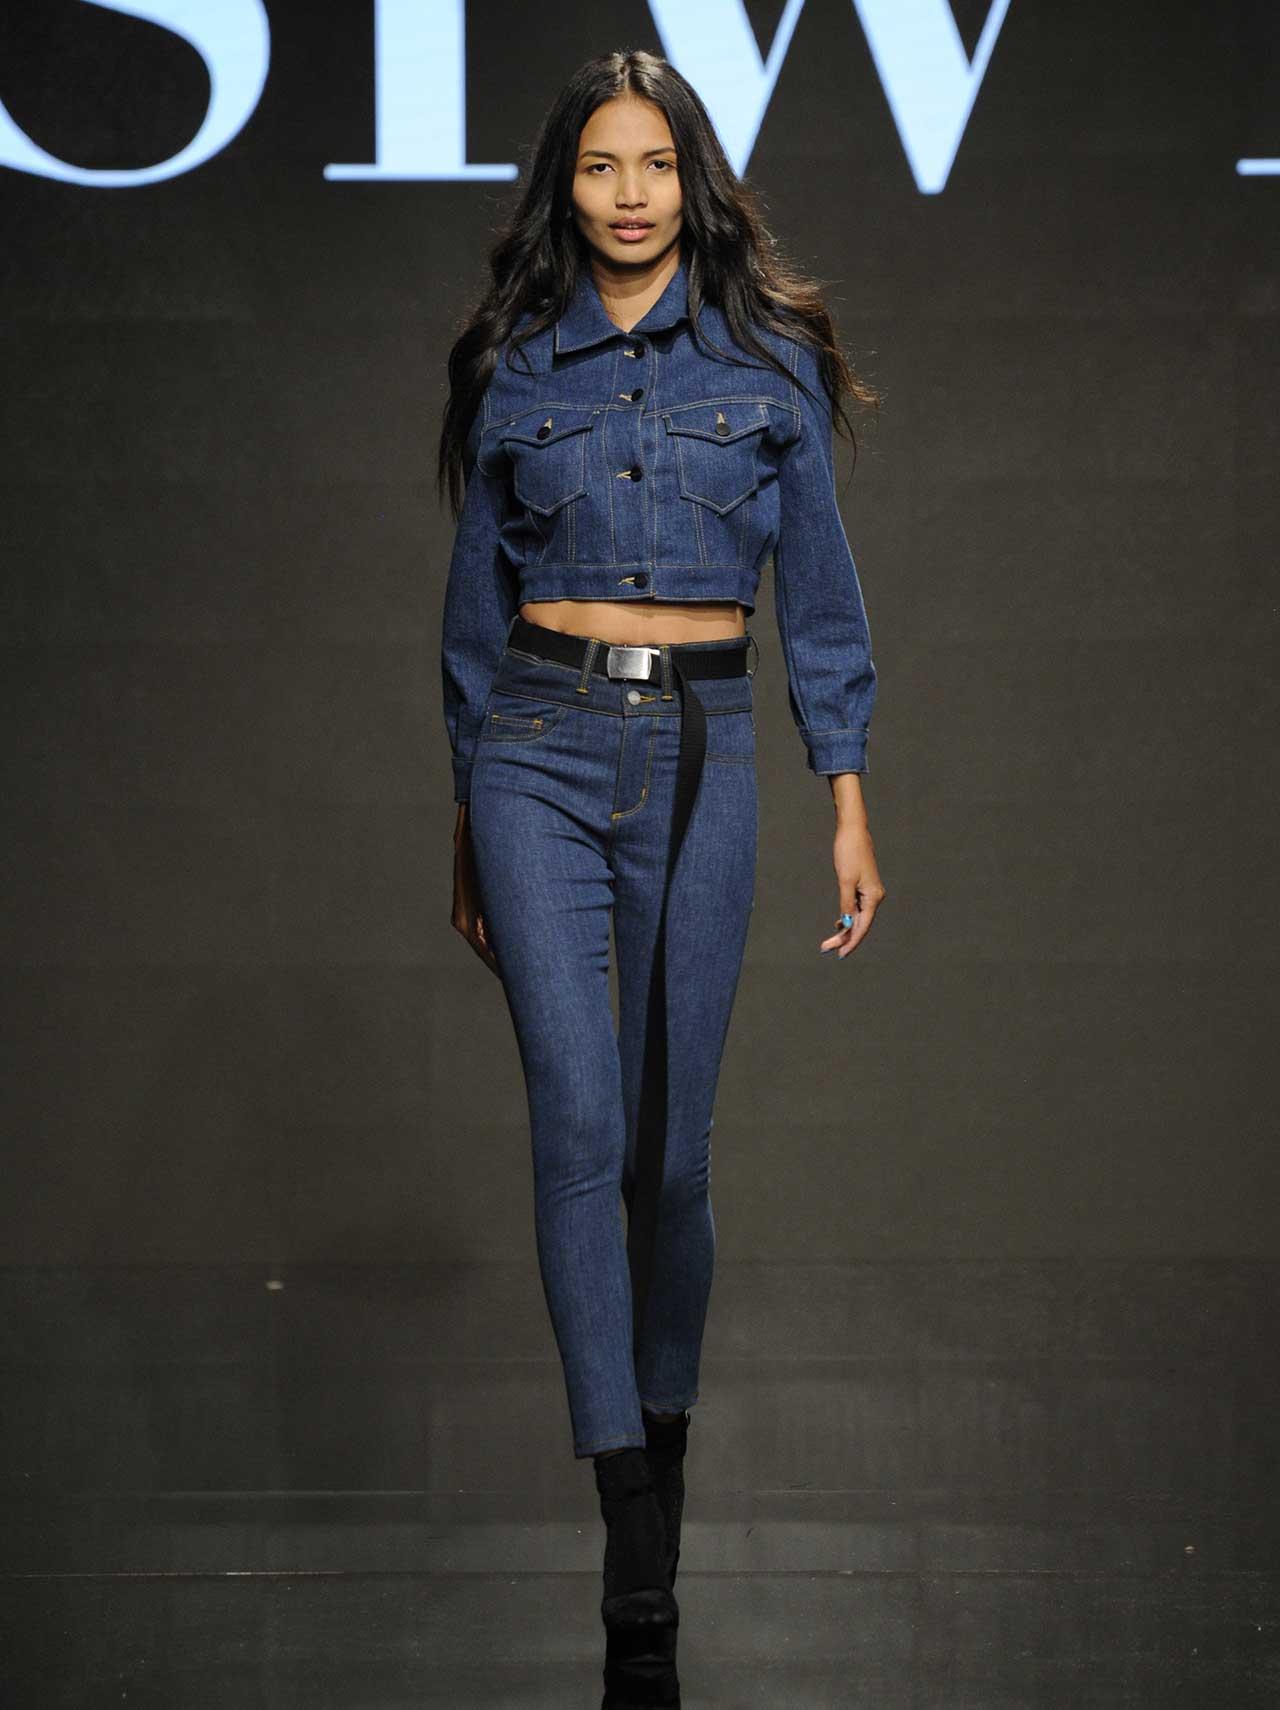 siwy-ss17-runway-show-denim-jeans-5